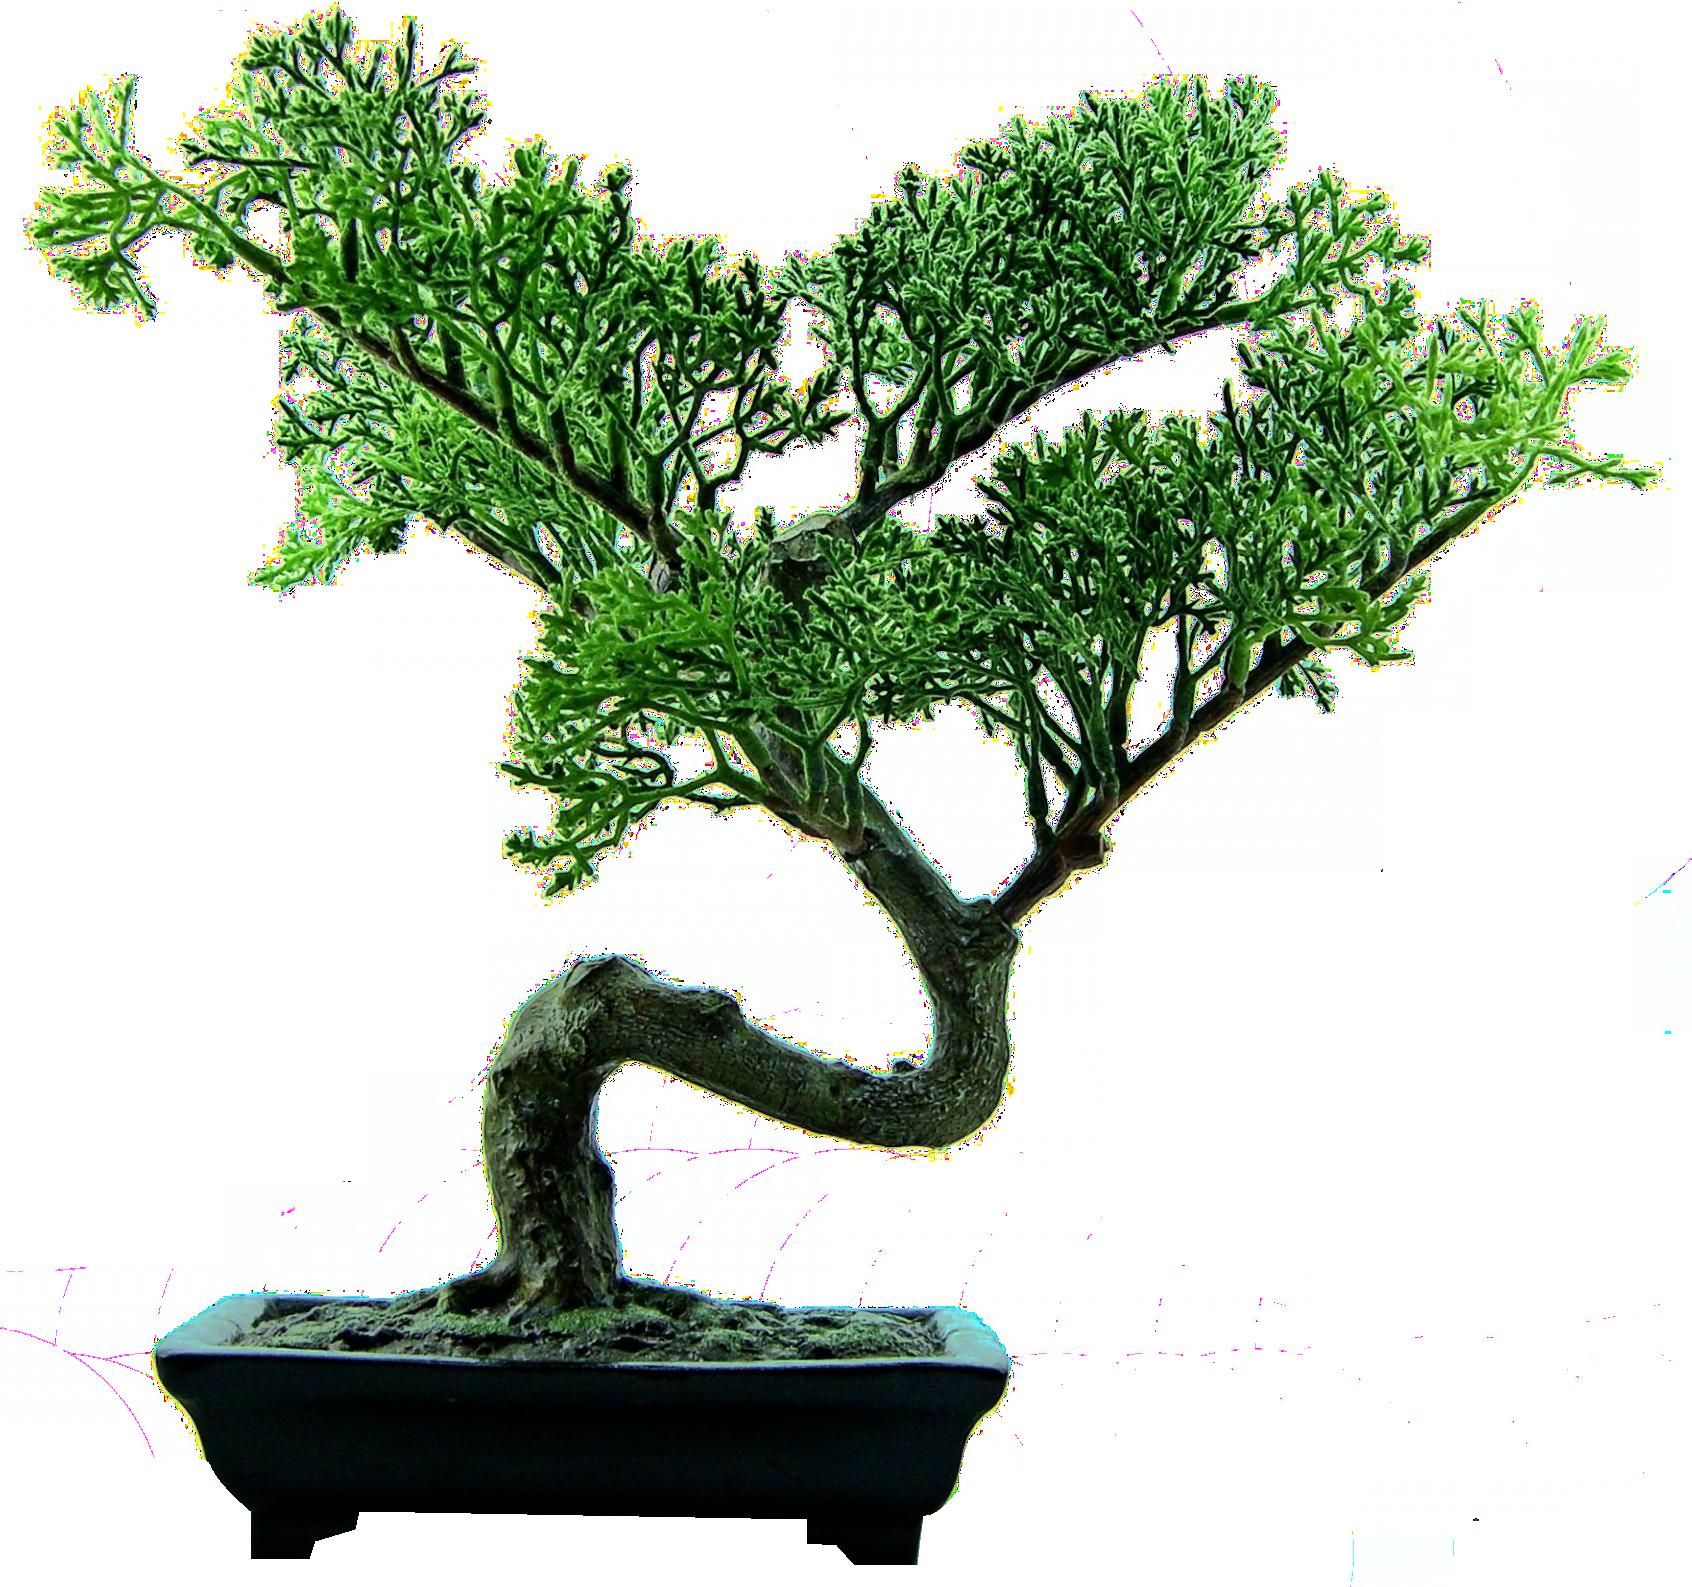 Bonsai Tree PNG Image.